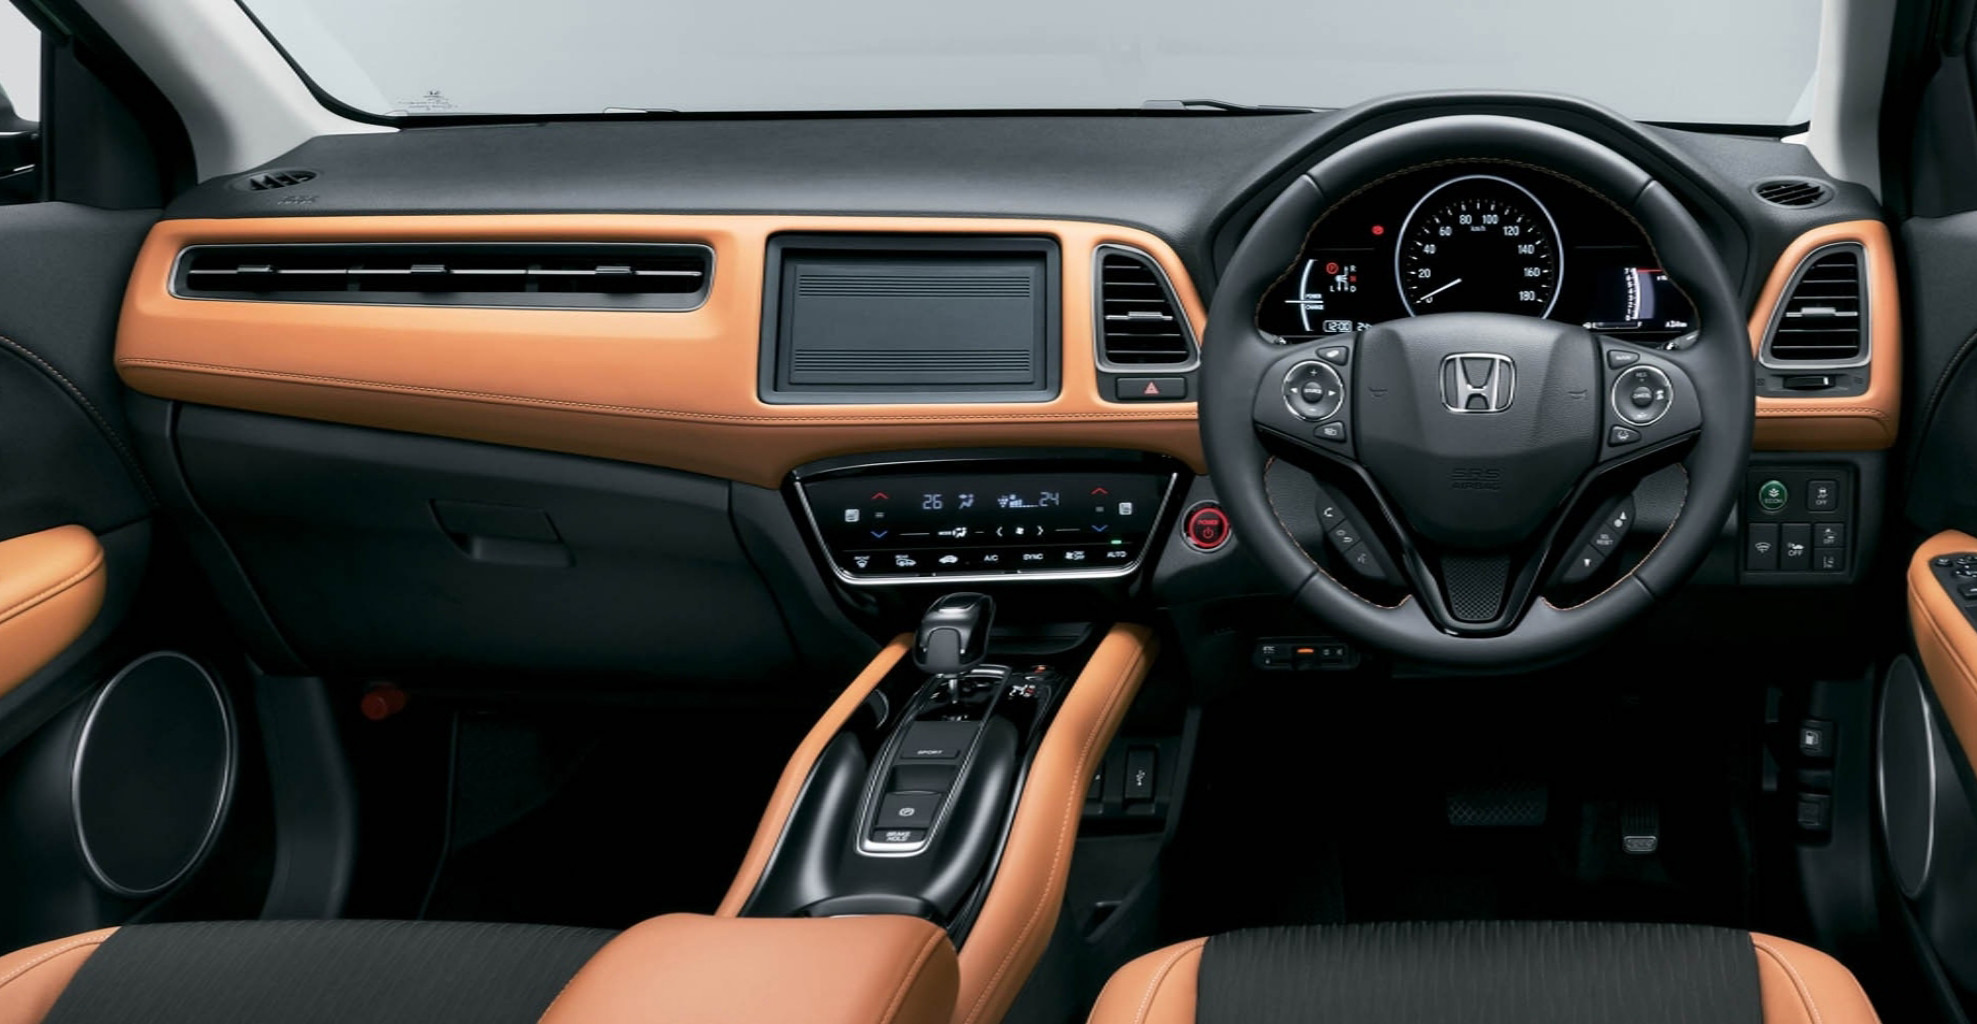 2019-honda-hr-v-facelift-launched-in-japan-as-new-vezel-autoevolution-interior.jpg